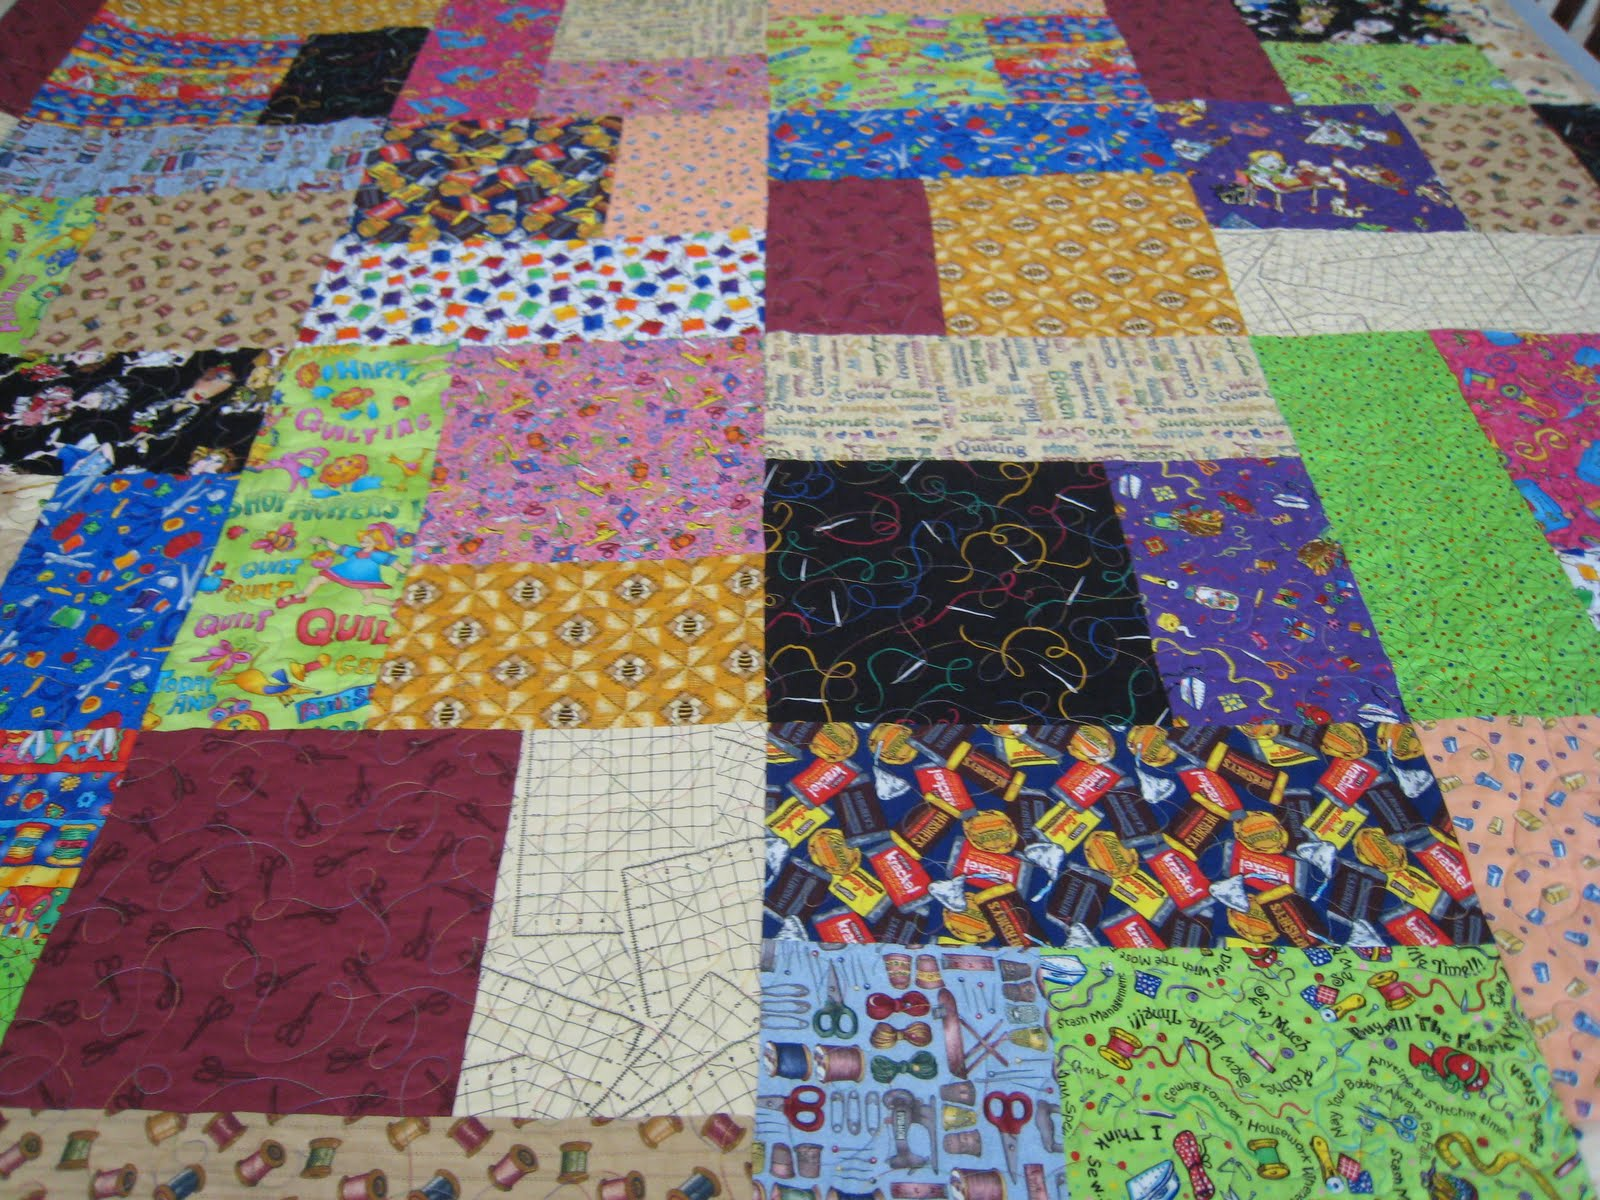 Quilt Bindings: Turning Twenty Quilt #2